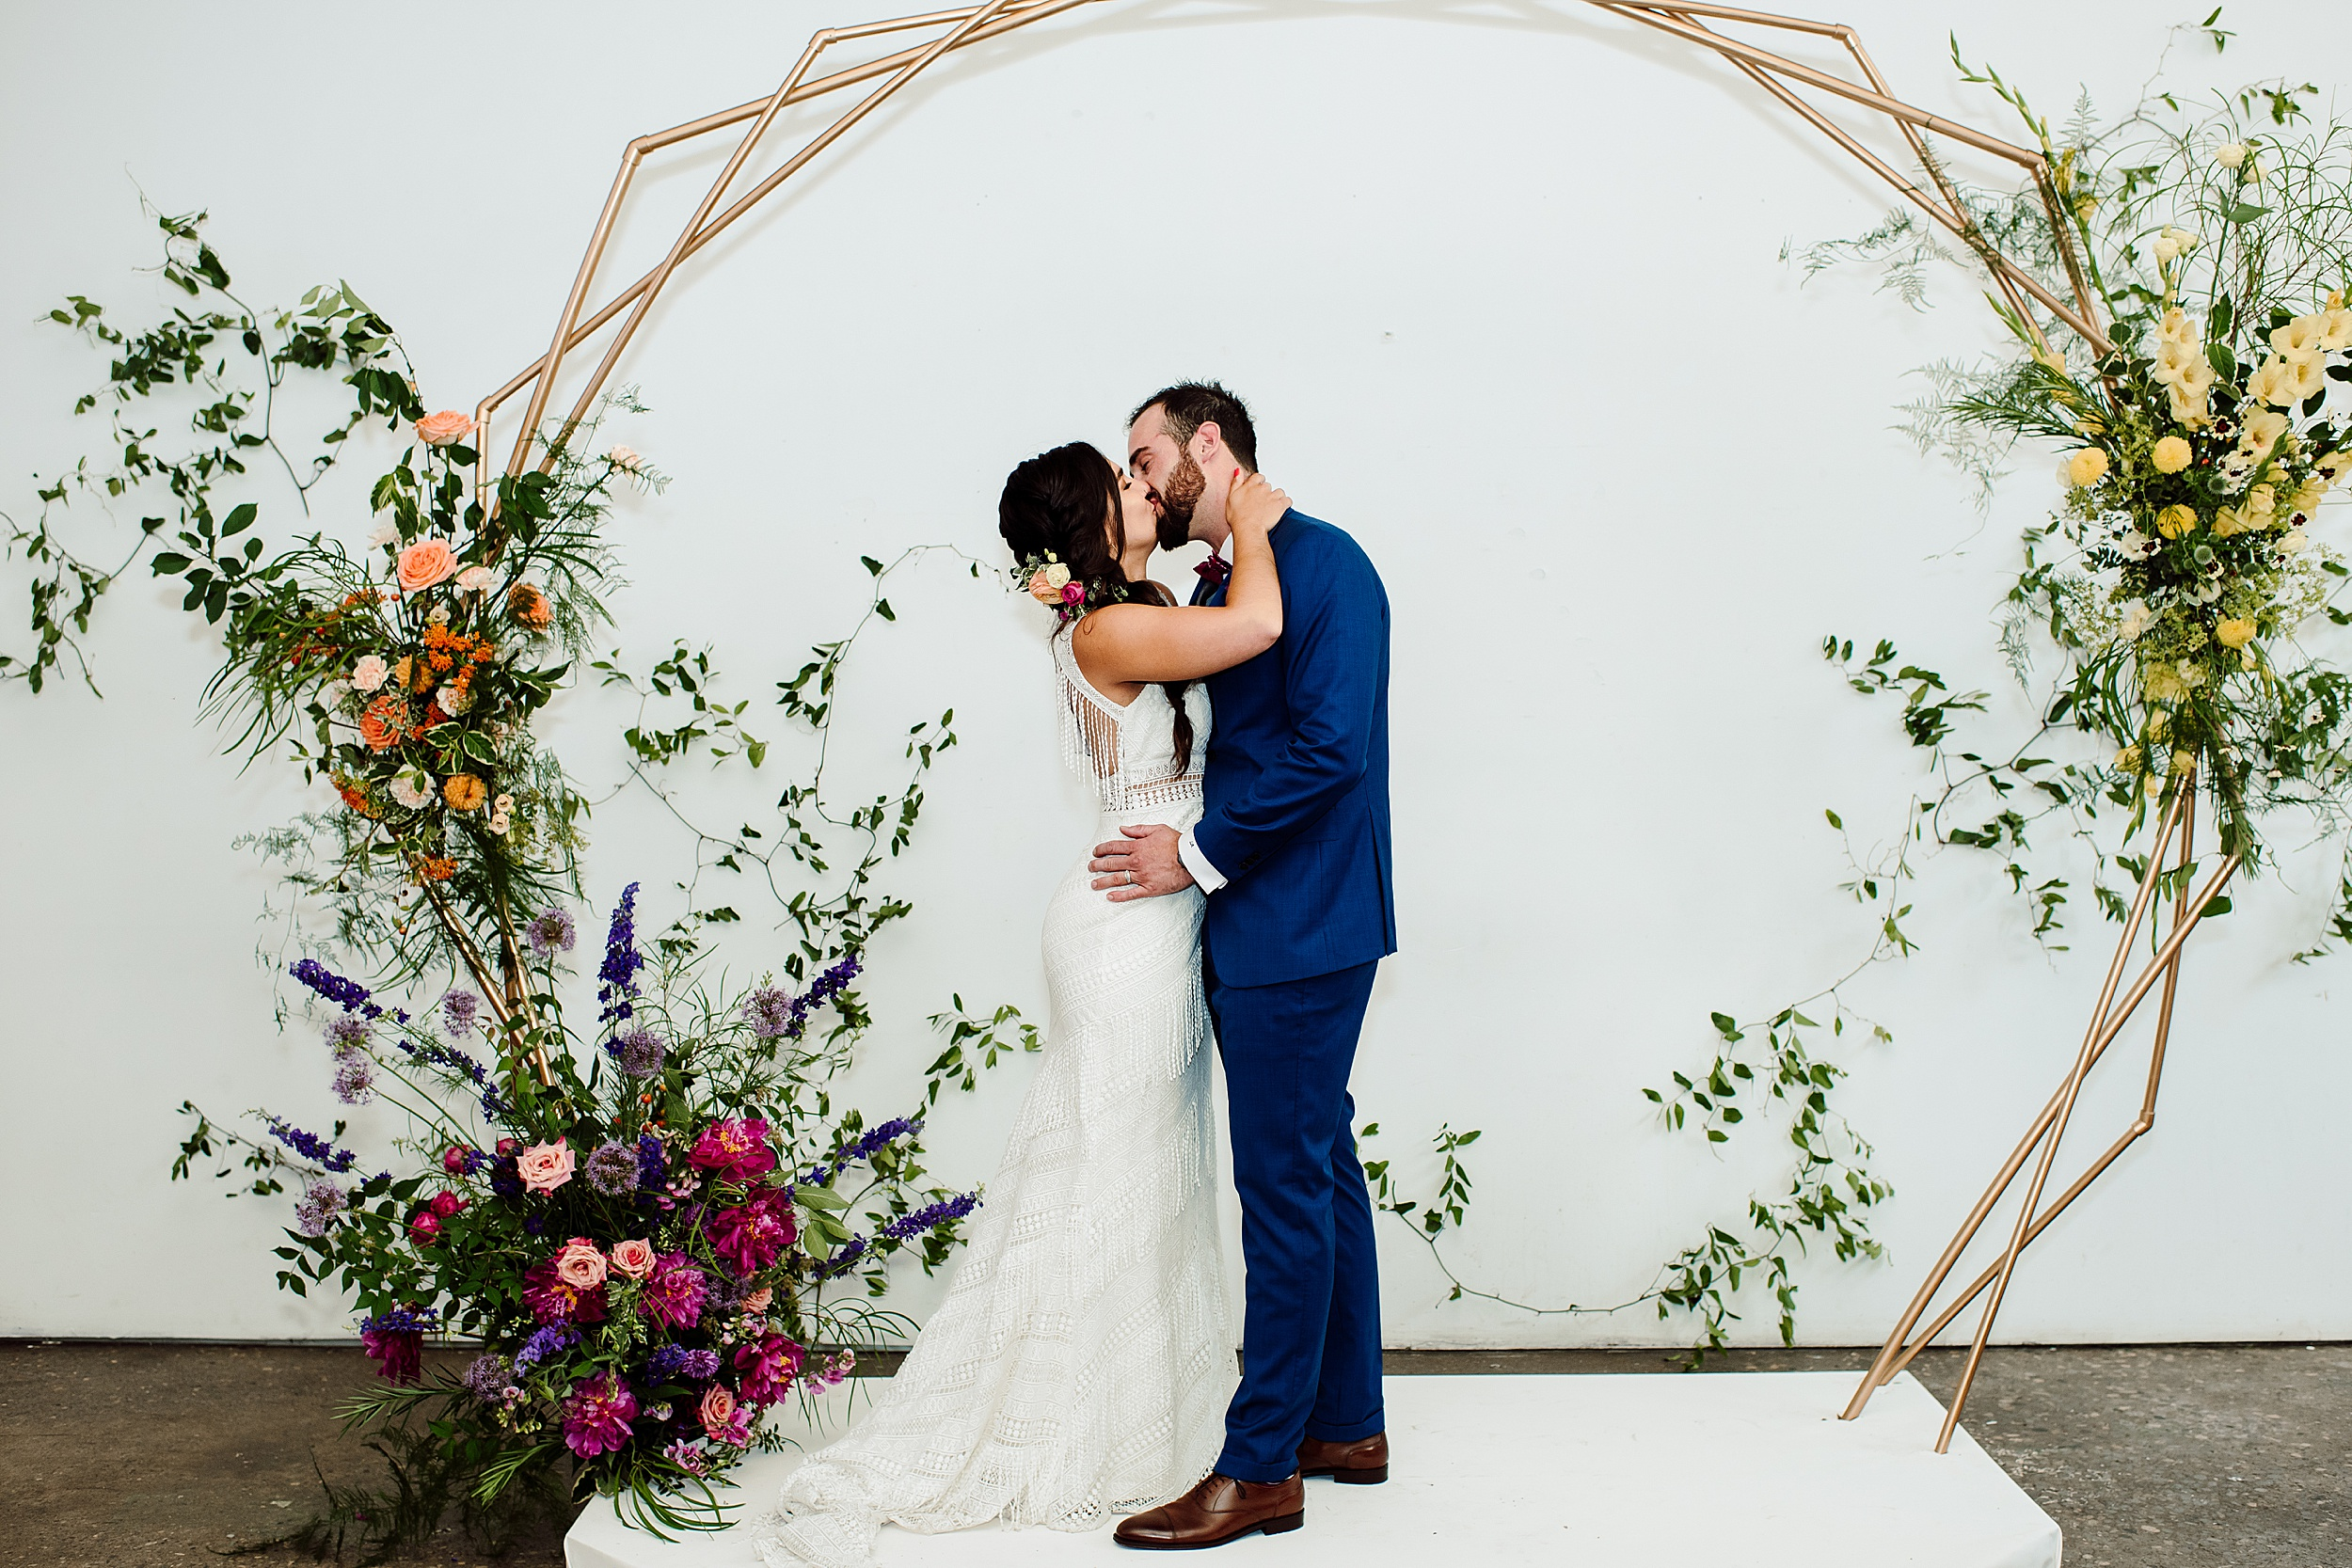 Airship-37-Berkeley-Events-Distillery-District-Wedding-Toronto-Wedding-Photographers_0069.jpg